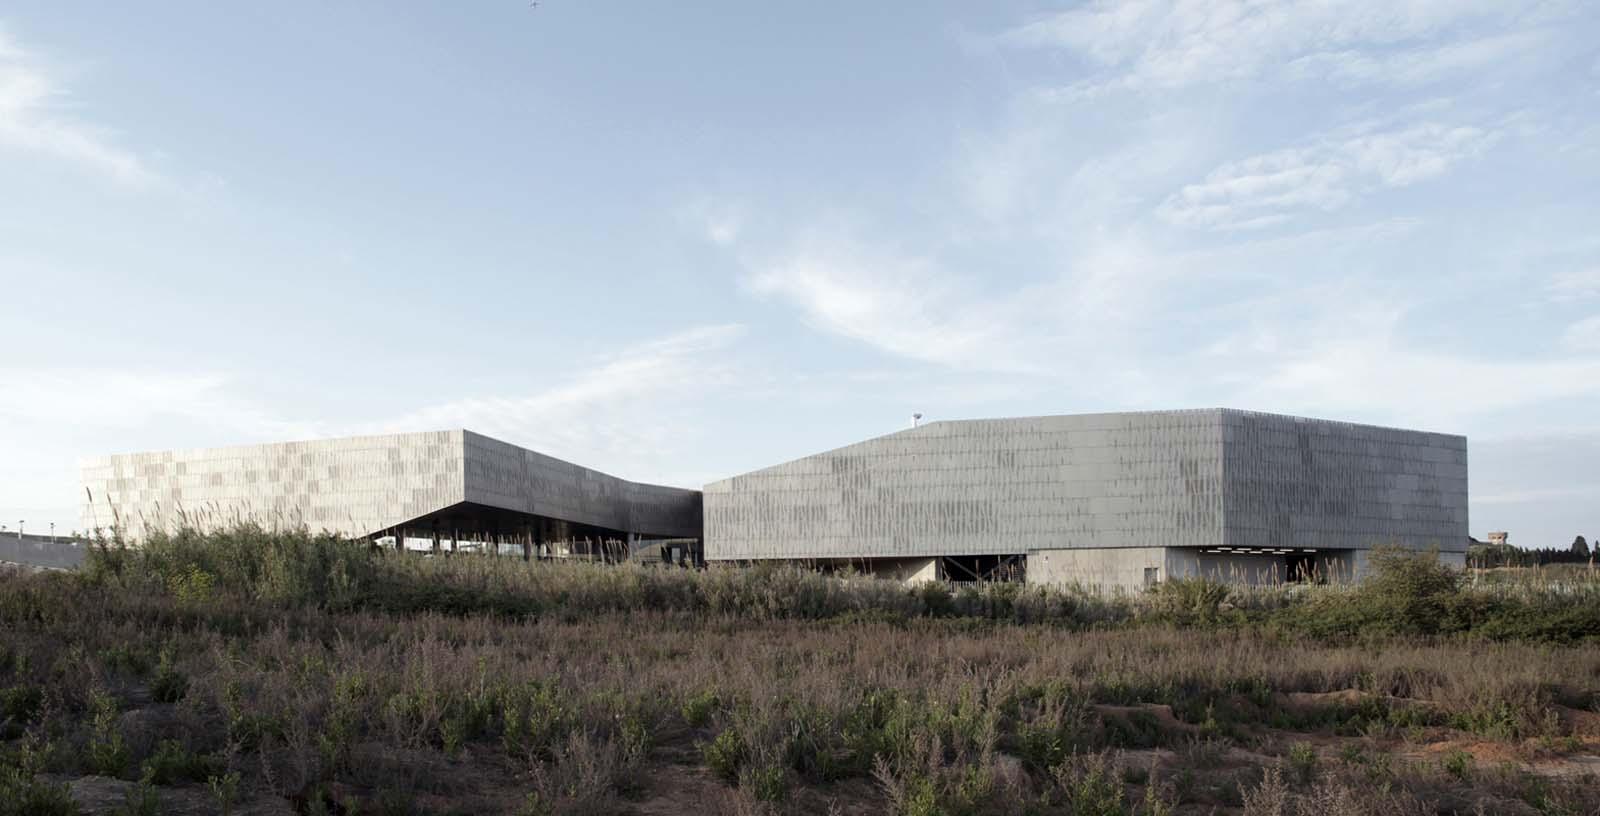 Data_Processing_Centre_01_Architecture_Idom_photo_Edouard_Decam